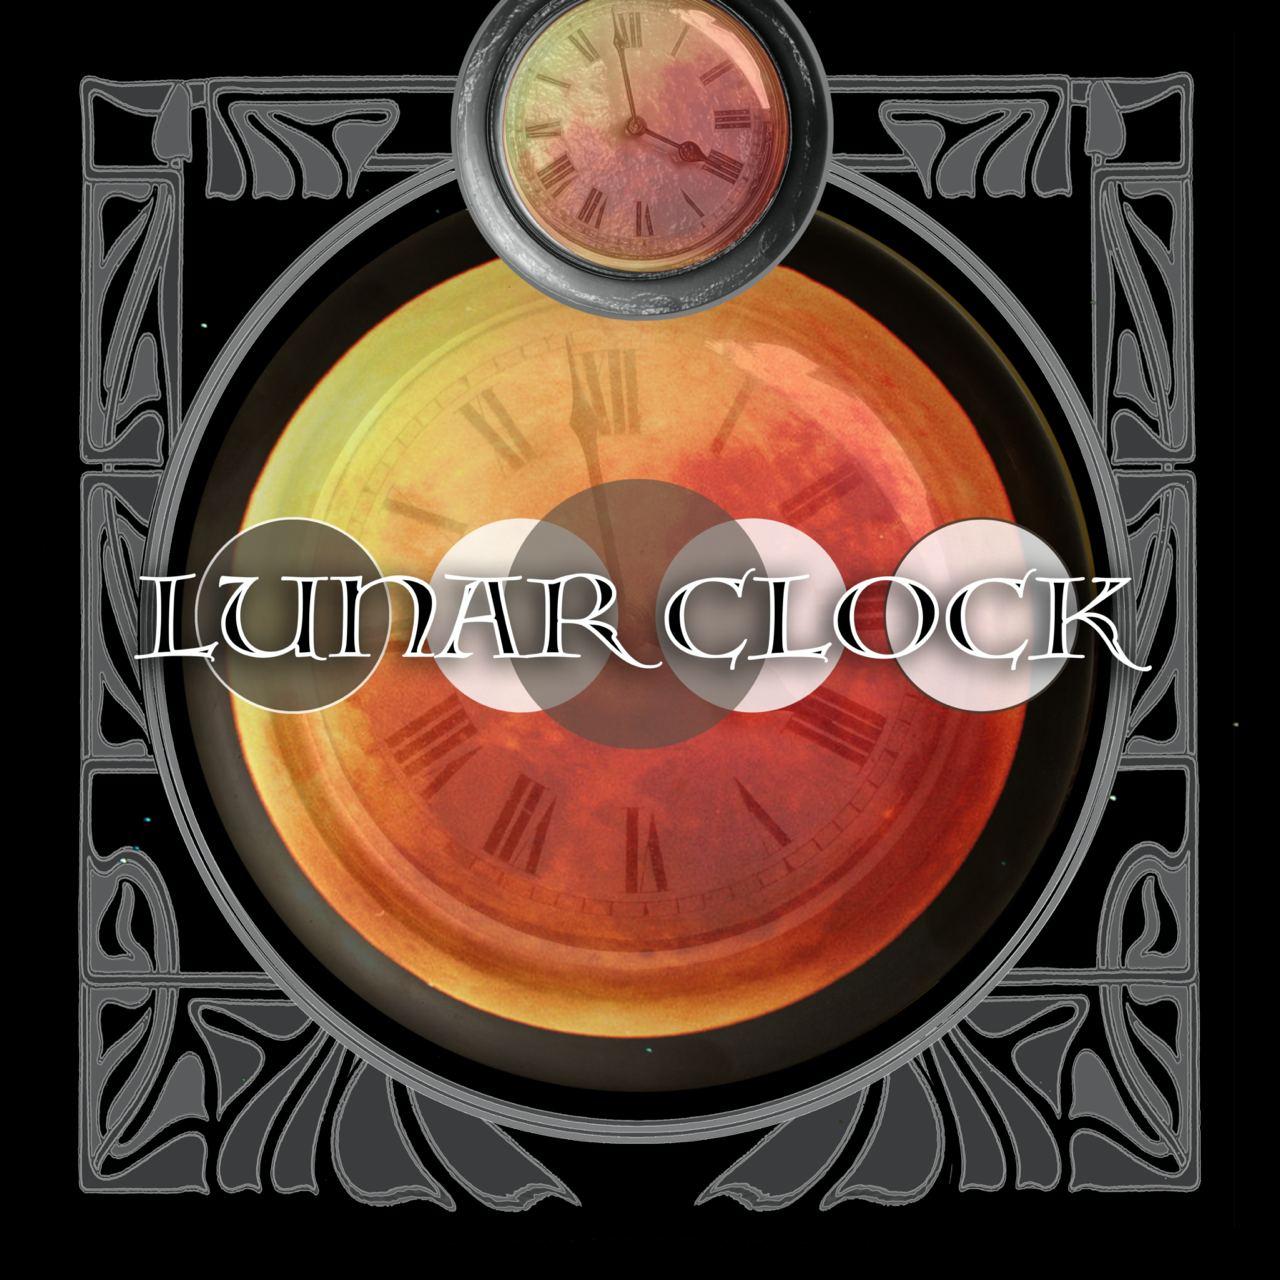 Lunar Clock logo